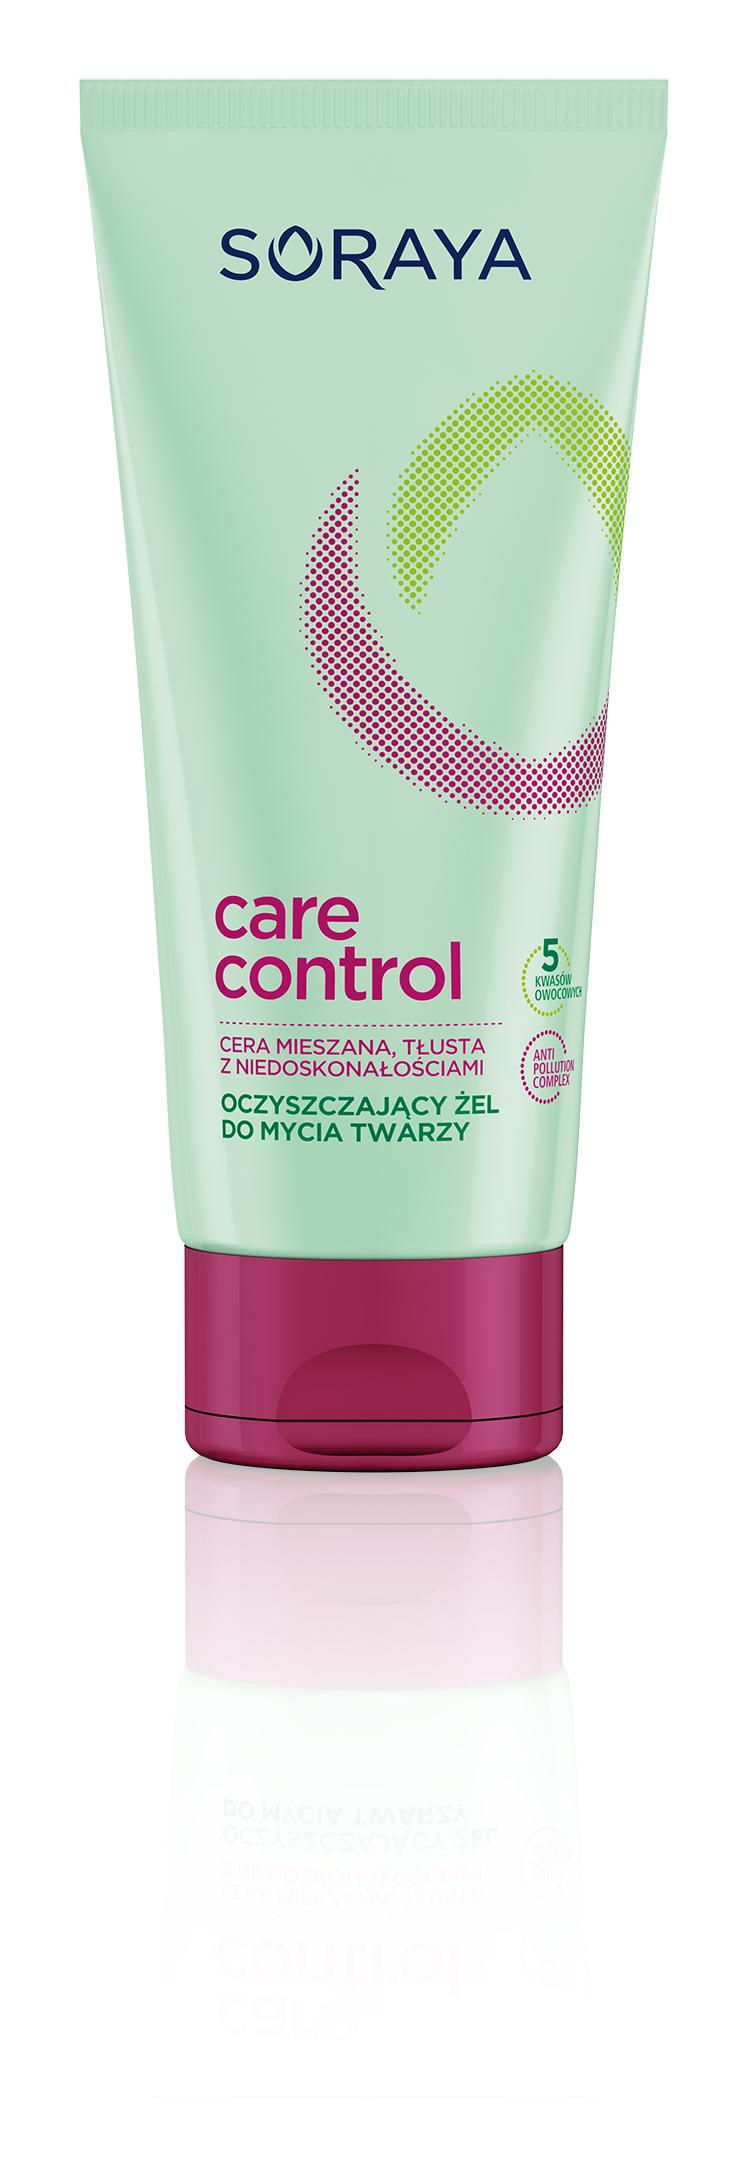 Soraya Care Control